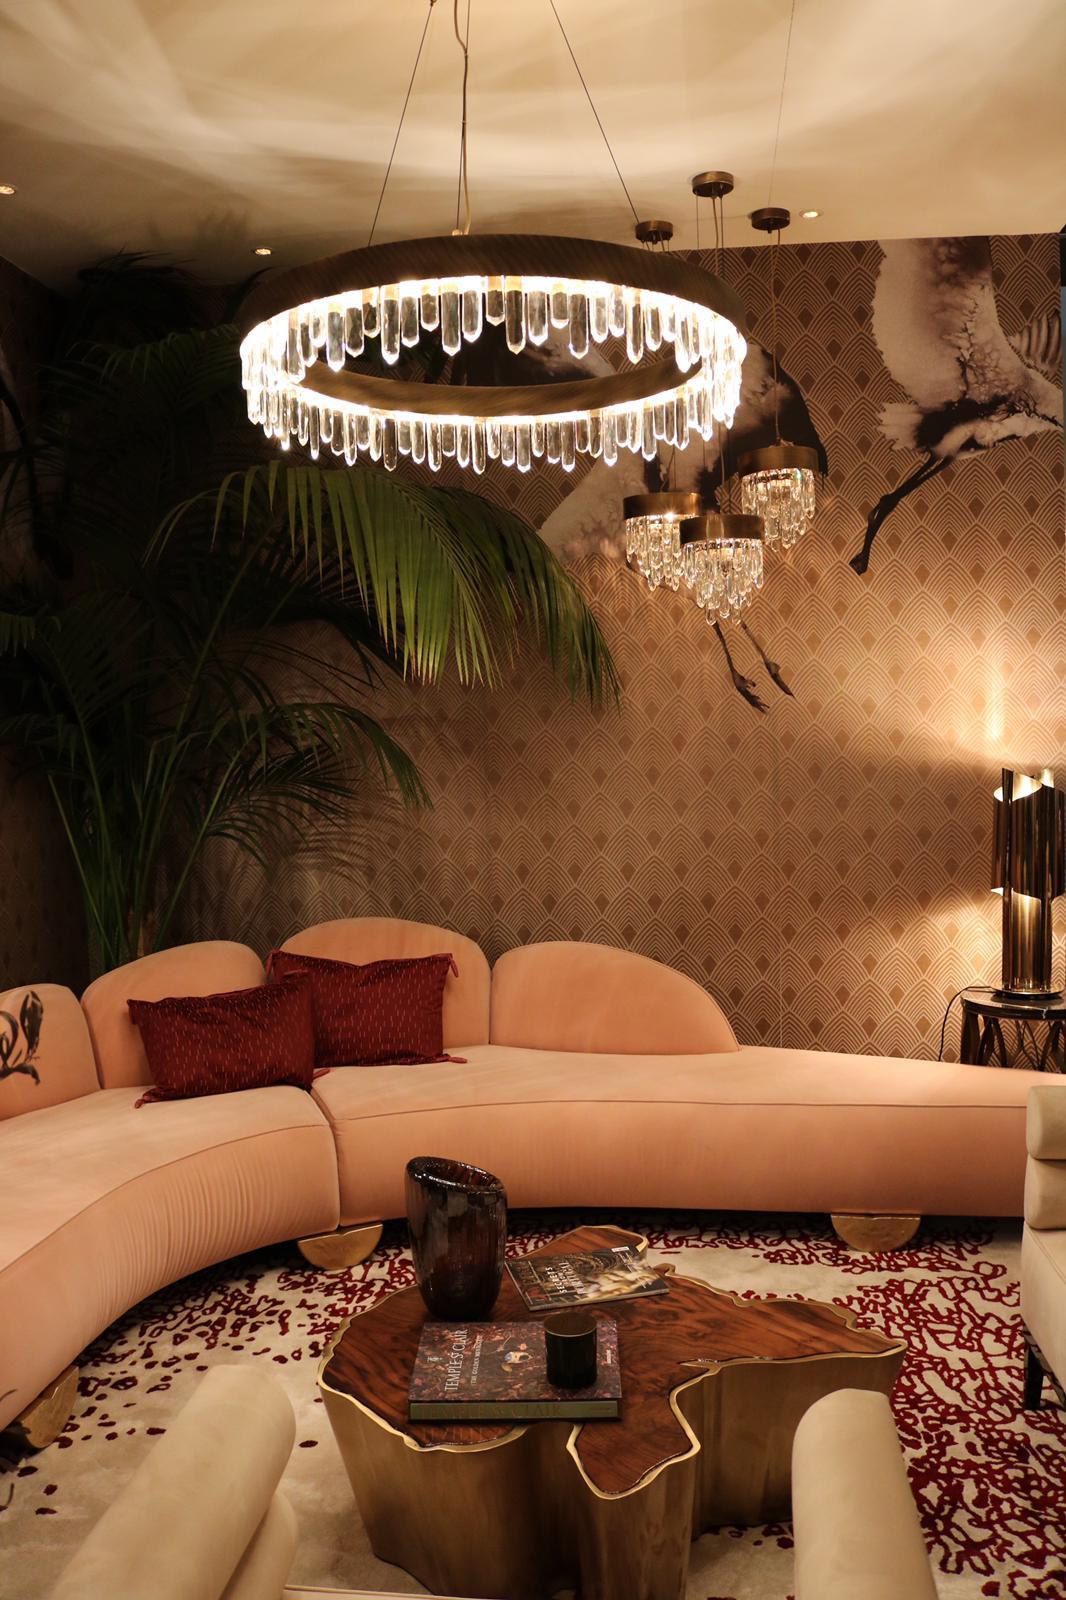 maison et objet 2019 Maison et Objet 2019: BRABBU Upholstery Fabrics in Paris BRABBU Fitzroy